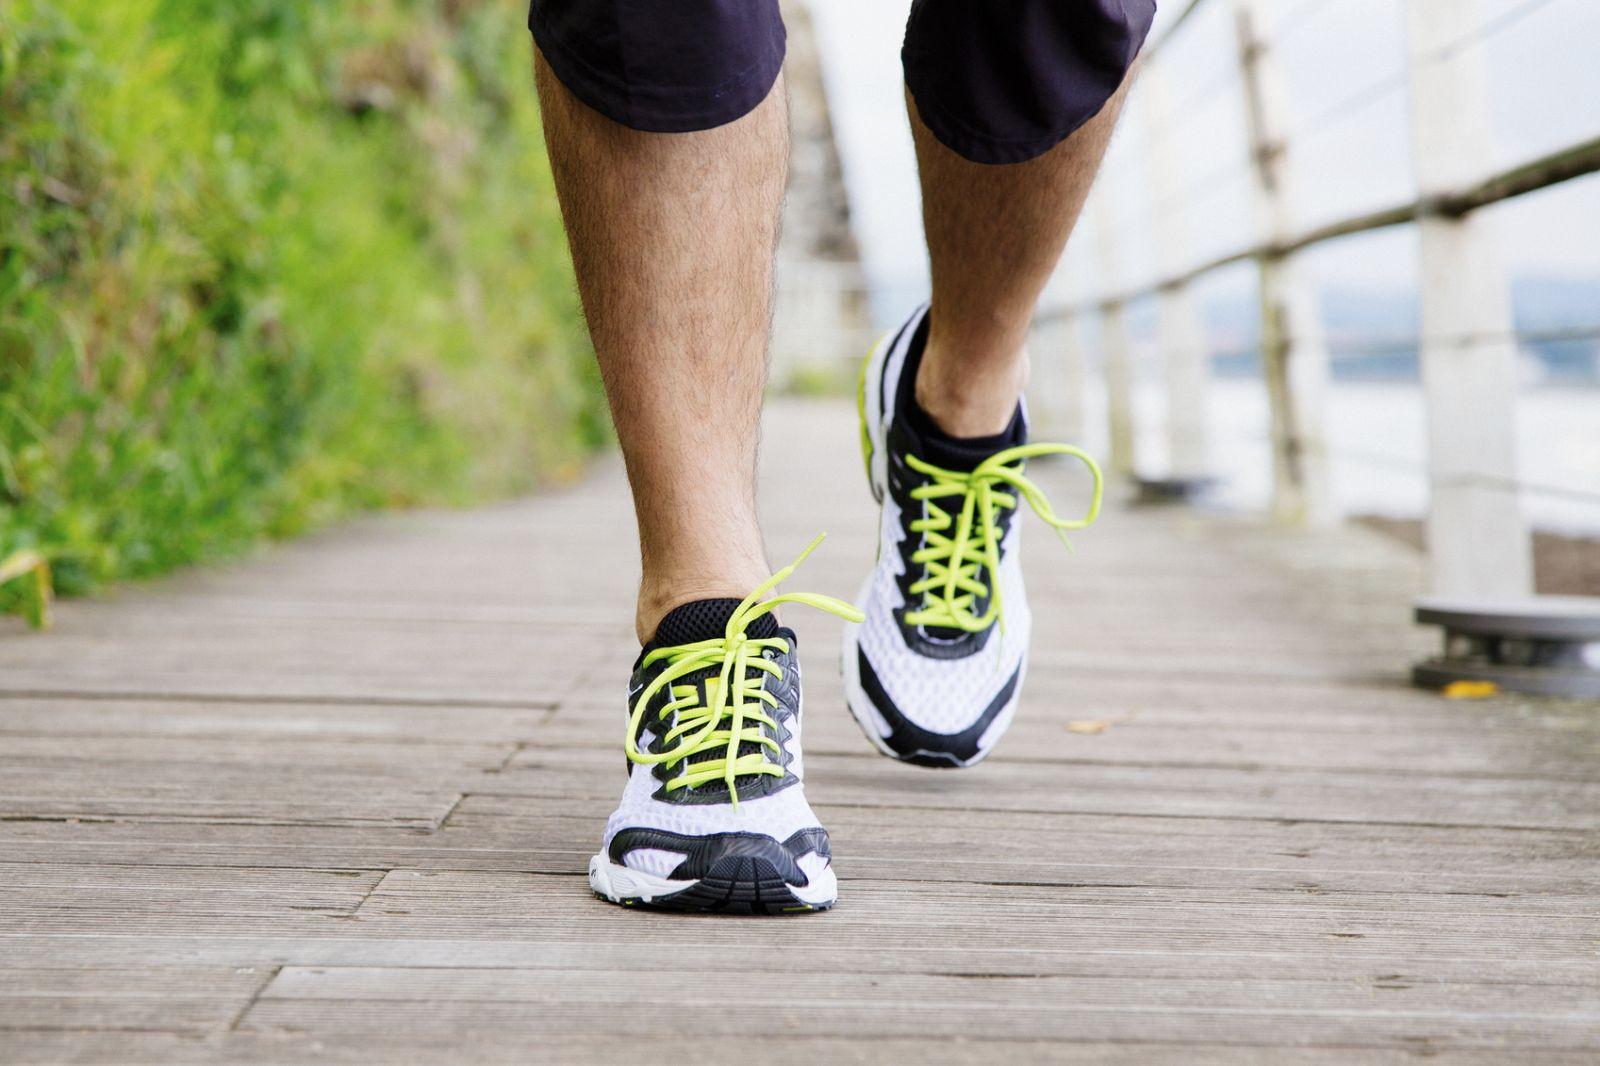 healthy feet healthy weight